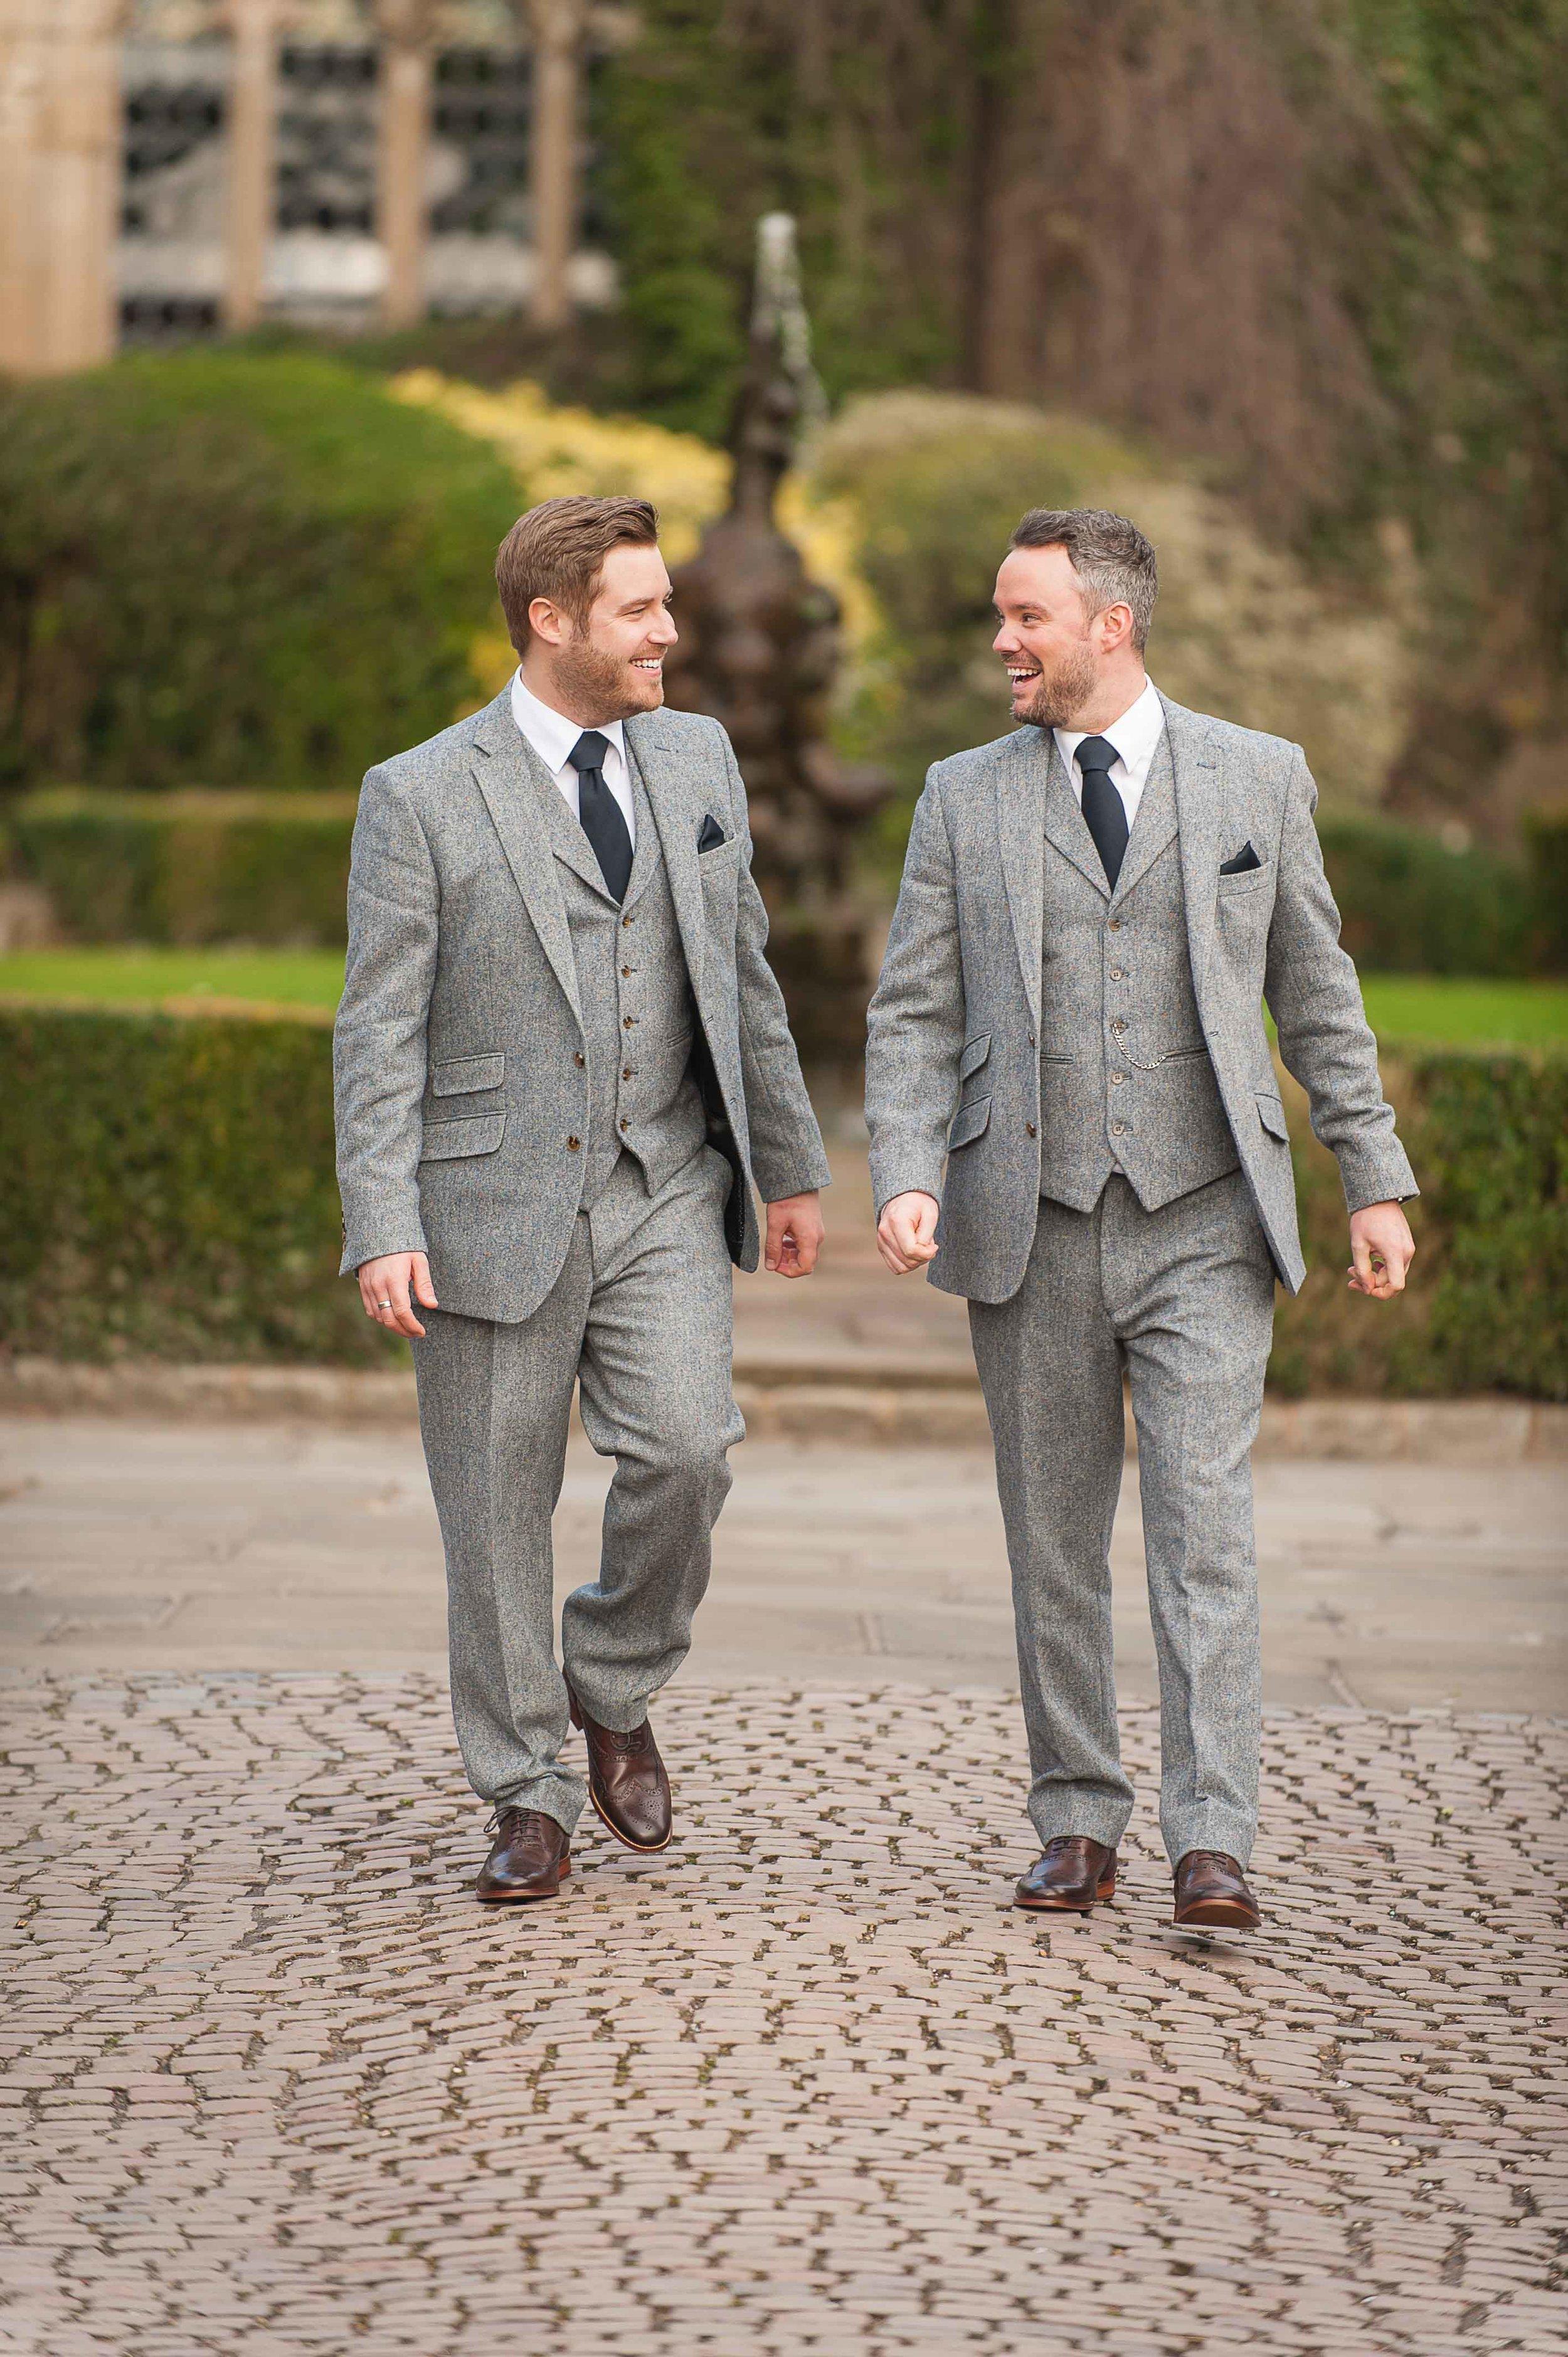 14.02.17 - Matt-Faye-Coombe-Abbey-Valentine-Wedding-Charnwood-Photography-1022.jpg